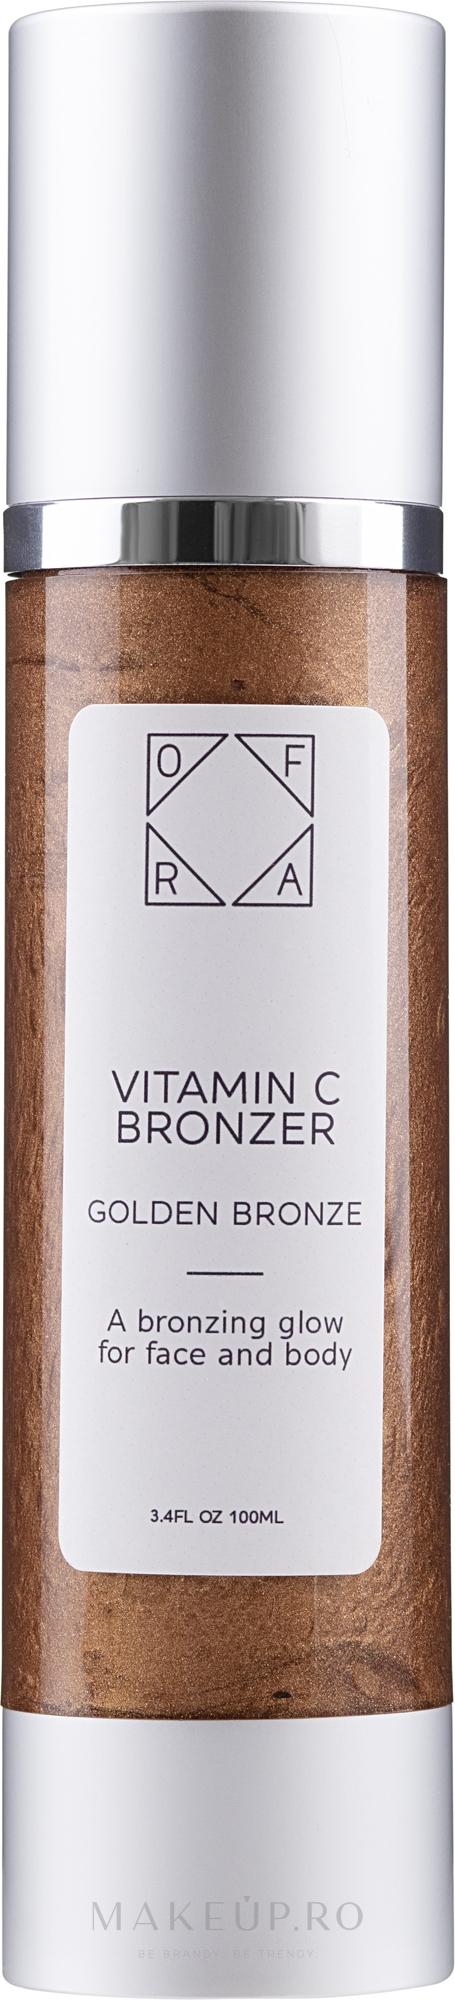 Bronzer - Ofra Vitamin C Bronzer — Imagine Golden Bronze